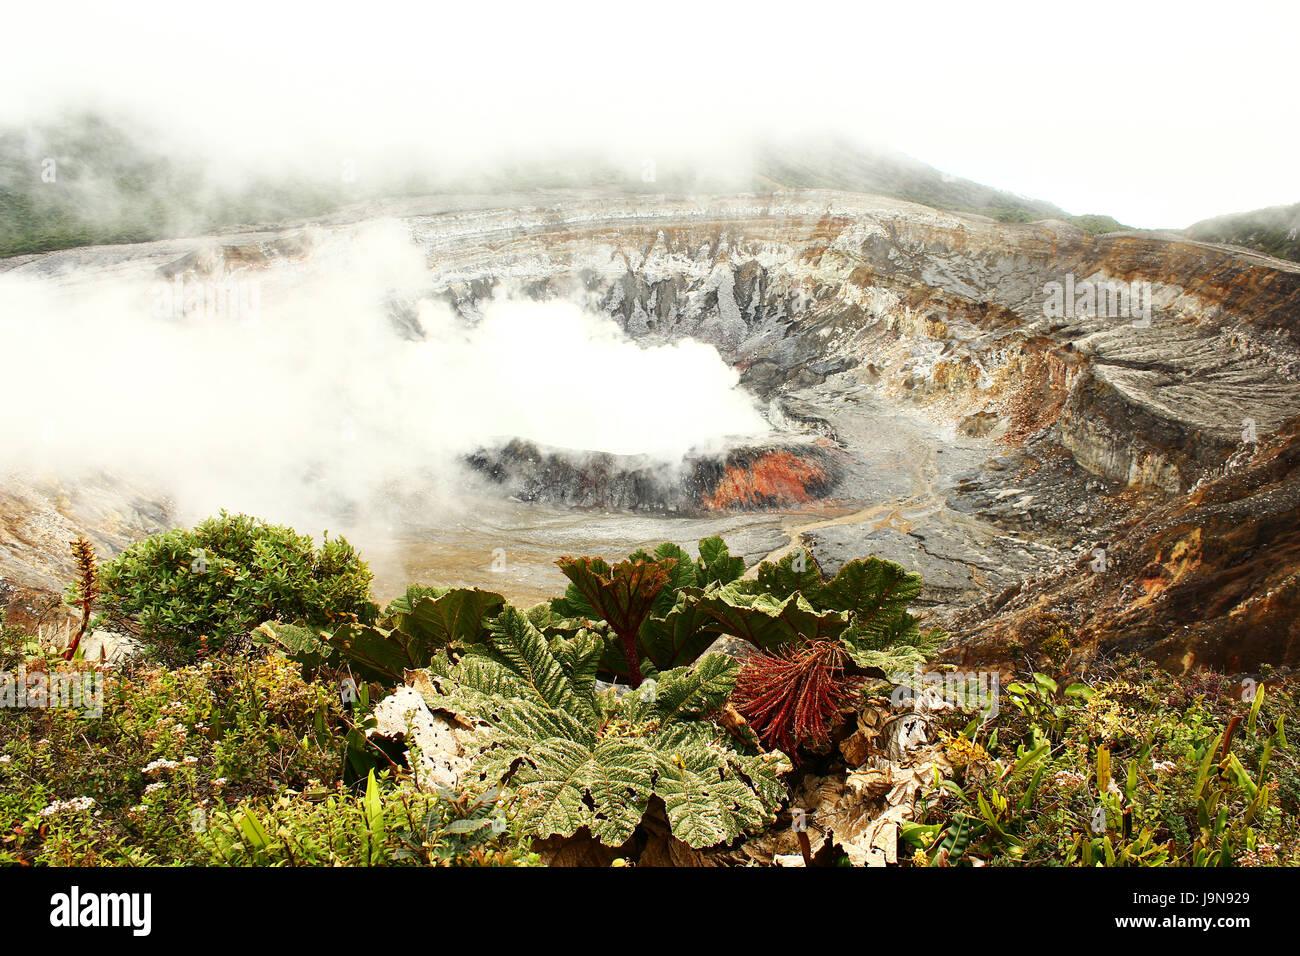 Picture of Volcano Poas in Costa Rica - Stock Image